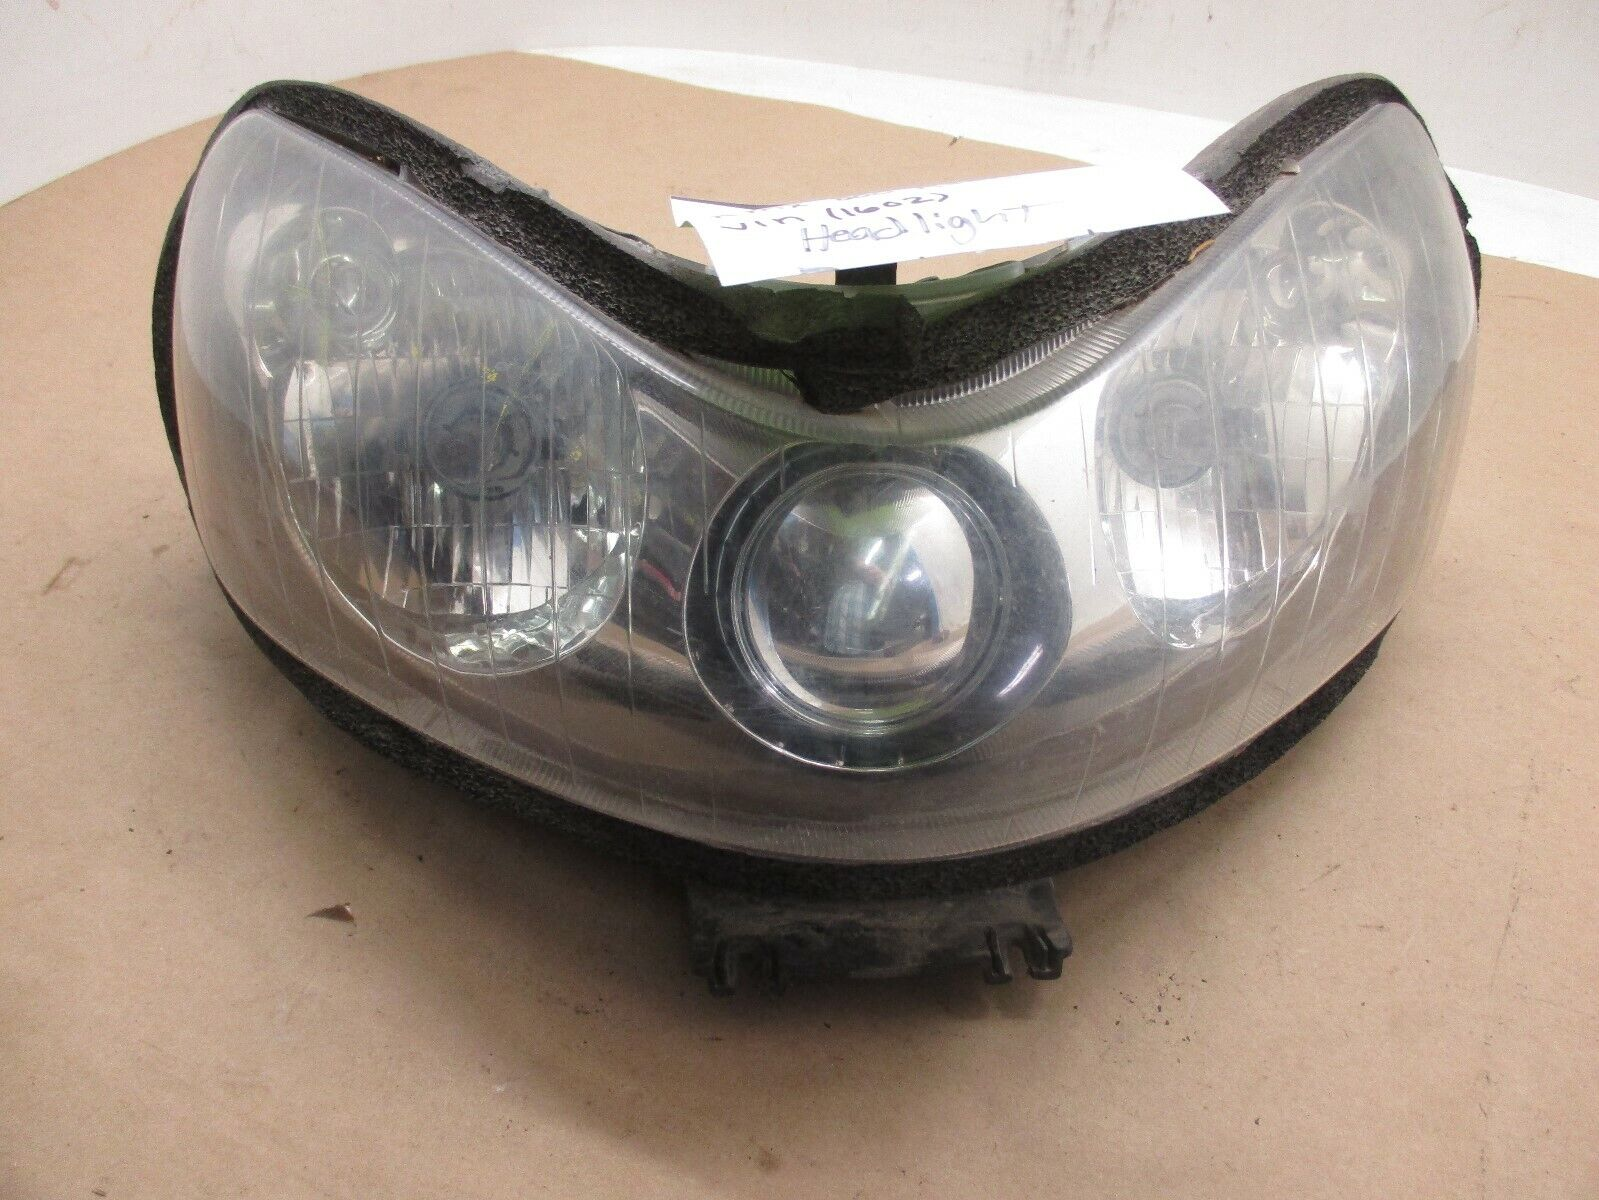 2009 Polaris 800 146 Assault RMK Dragon Headlight 2410397 (1602)